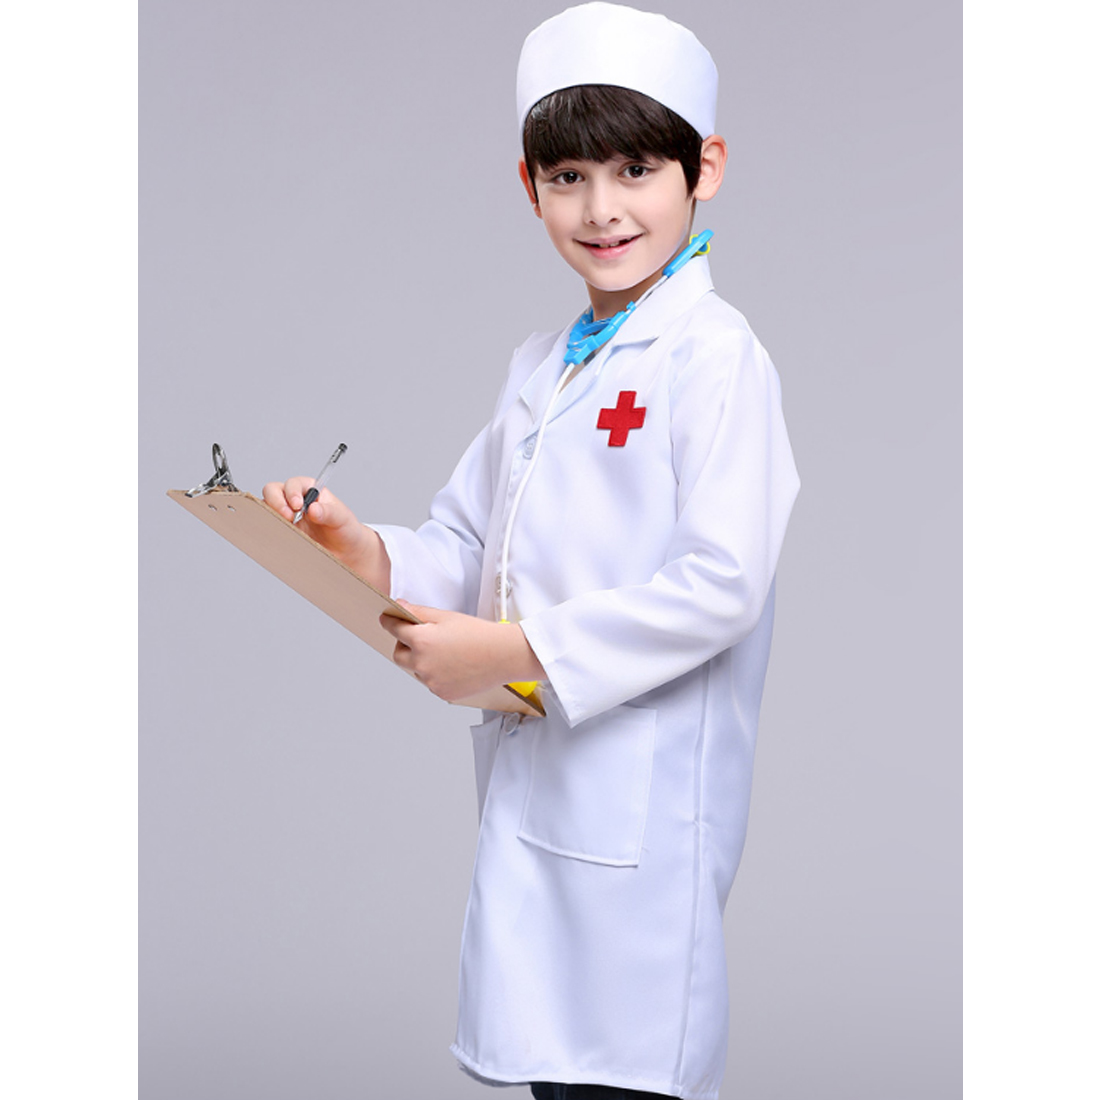 Doctor Pretend Play Little Nurse Doctor Role